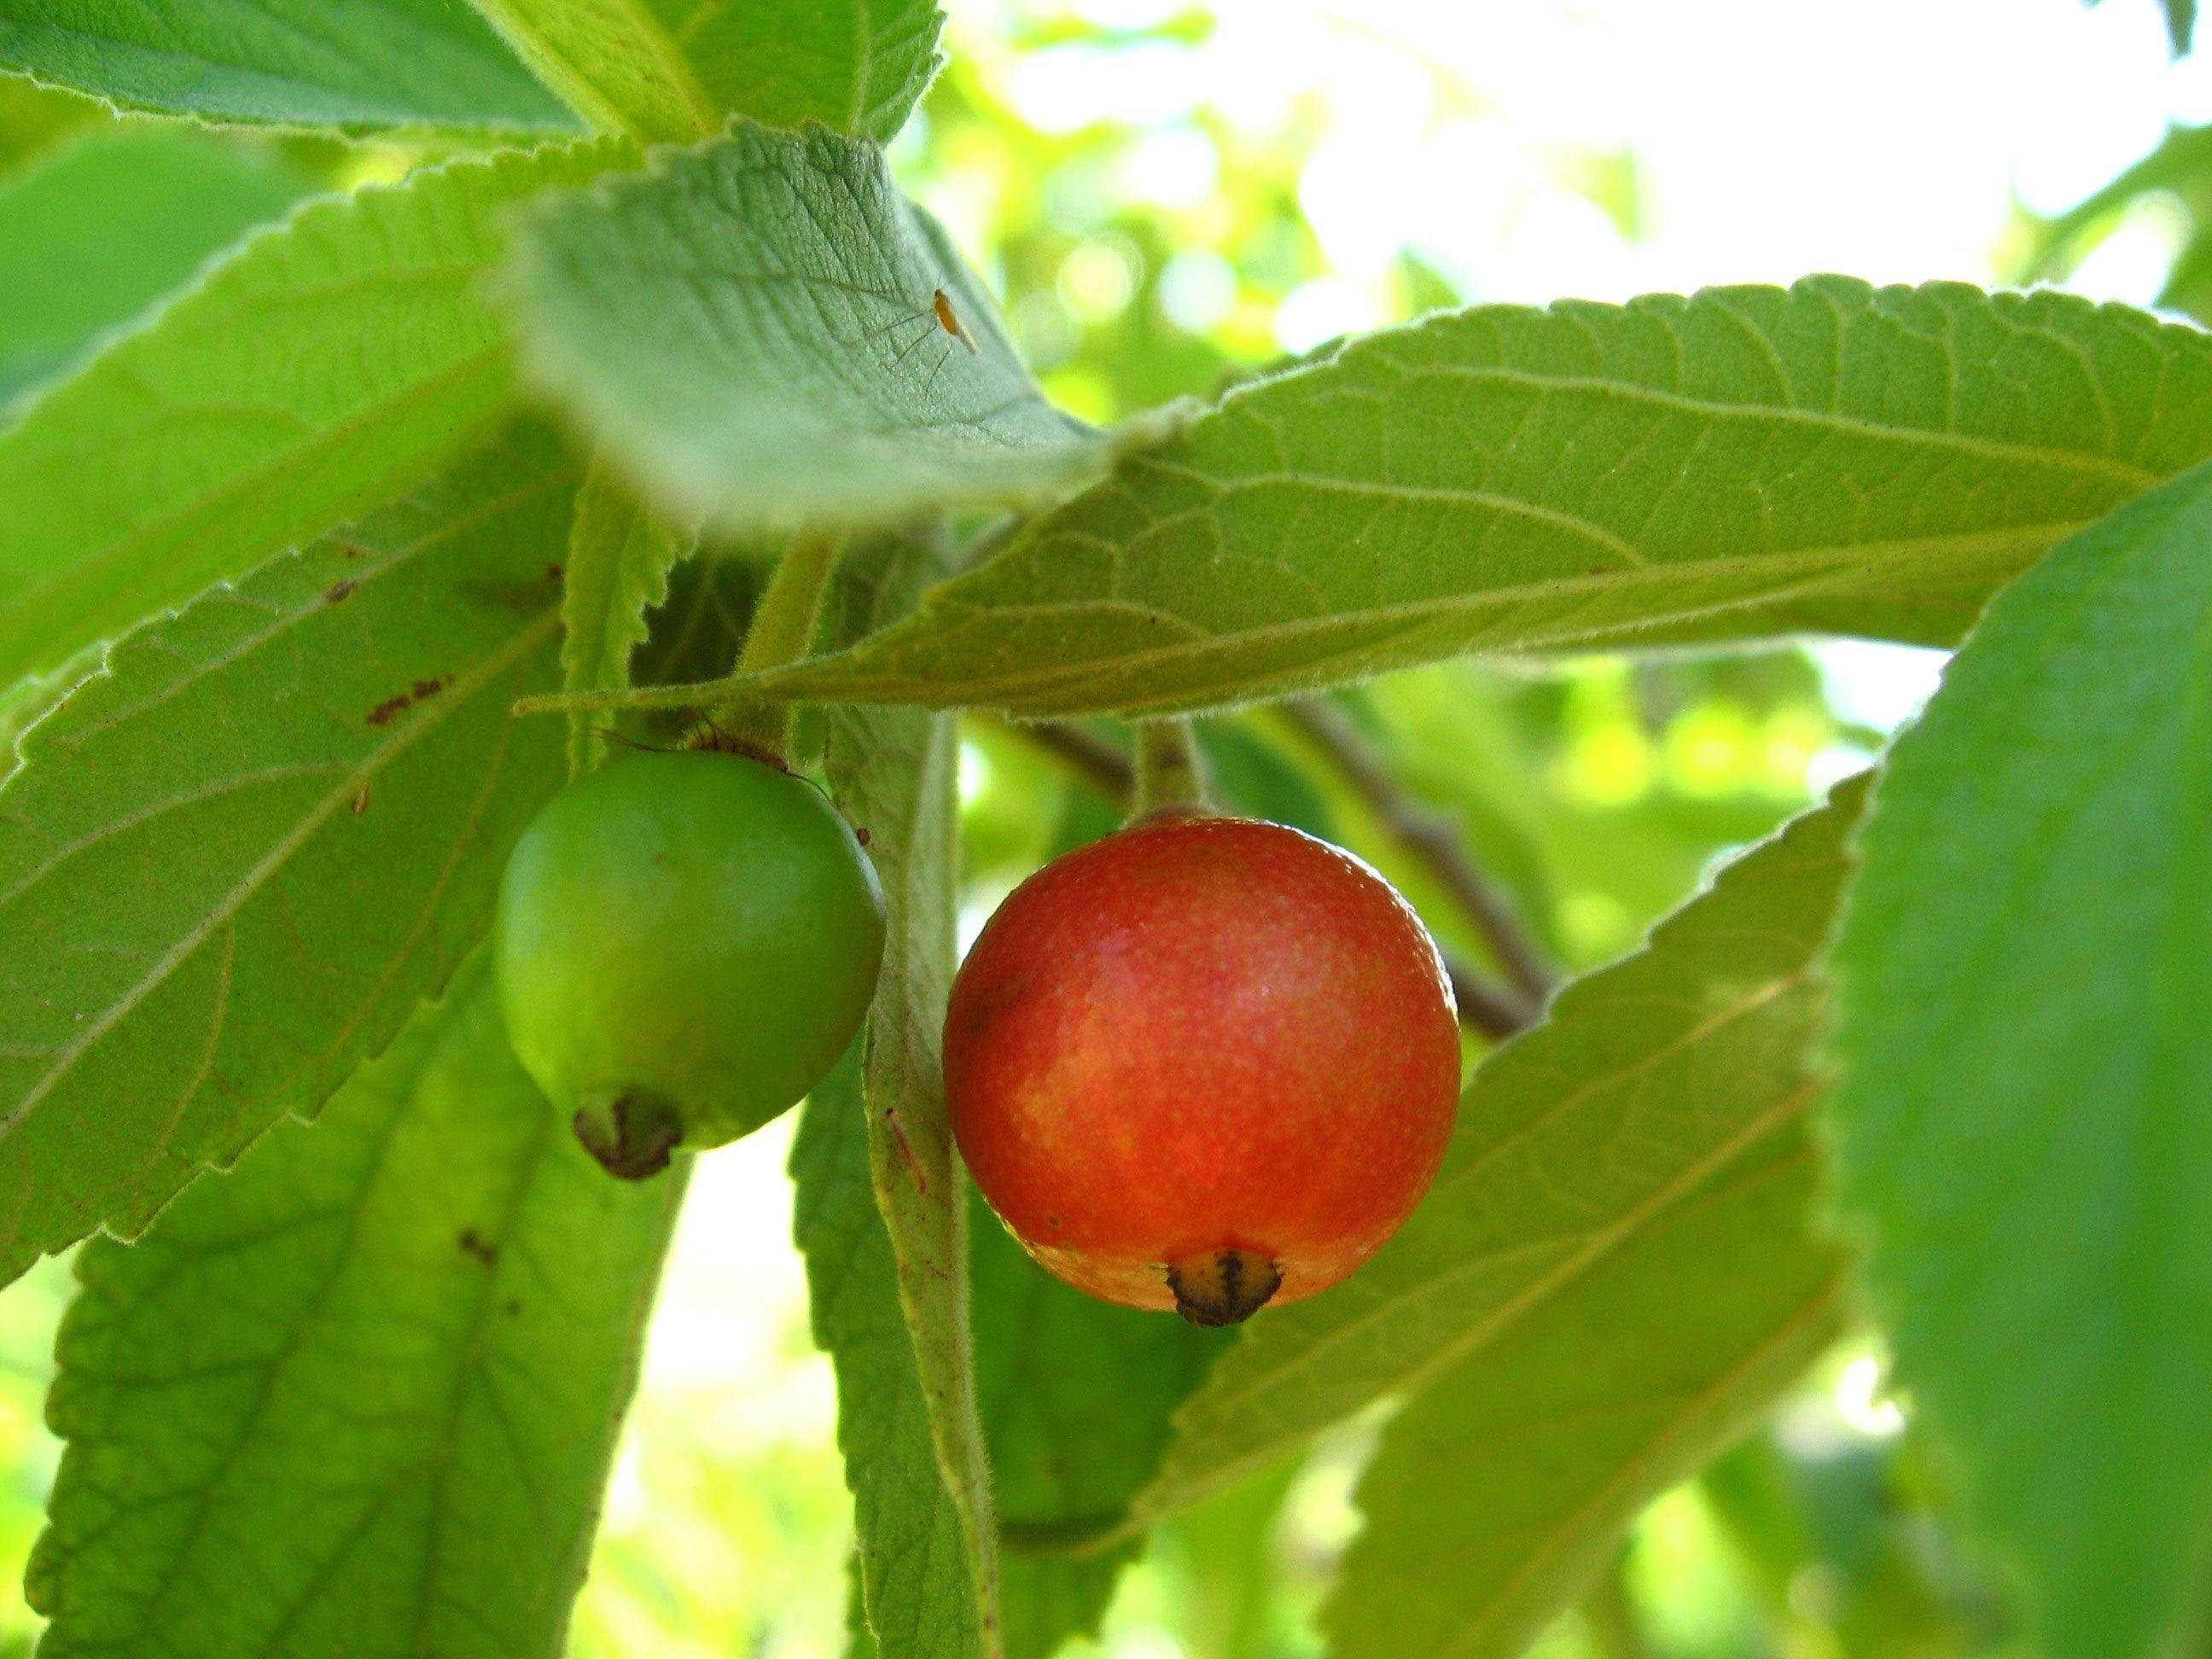 Panama Berry 52 Jpeg 2 592 1 944 Pixels Fruit Trees Fruit Tropical Fruits